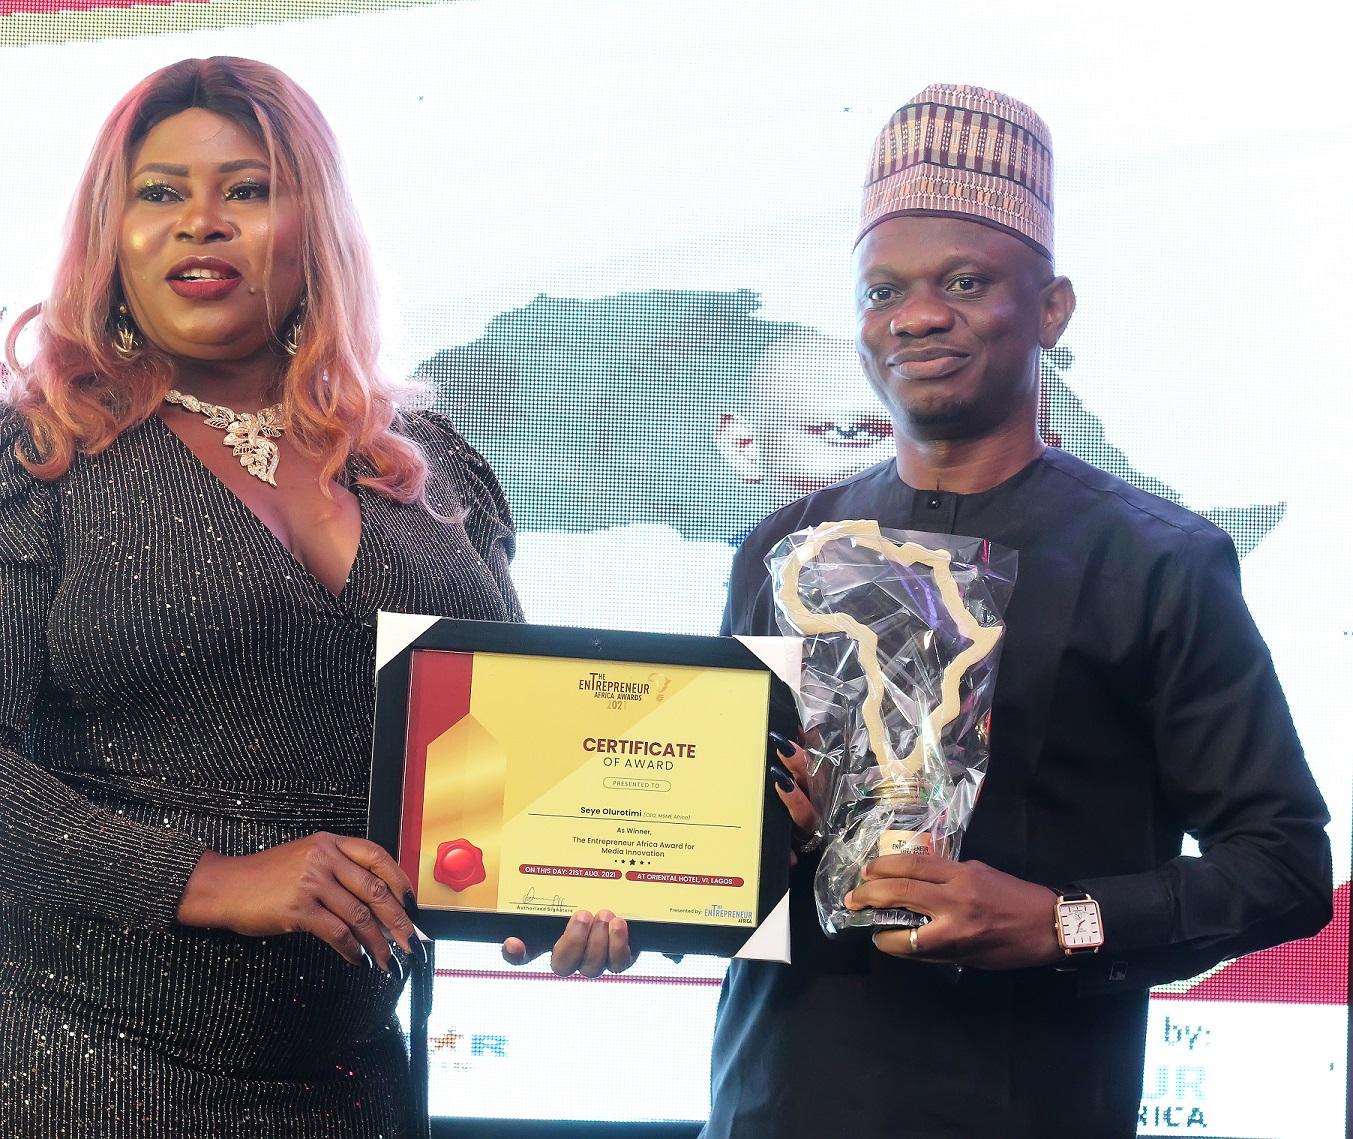 Seye Olurotimi, Founder of MSME Africa receiving the Entrepreneurs Africa Award for Media Innovation at the Entrepreneurs Africa Awards 2021 held recently in Lagos